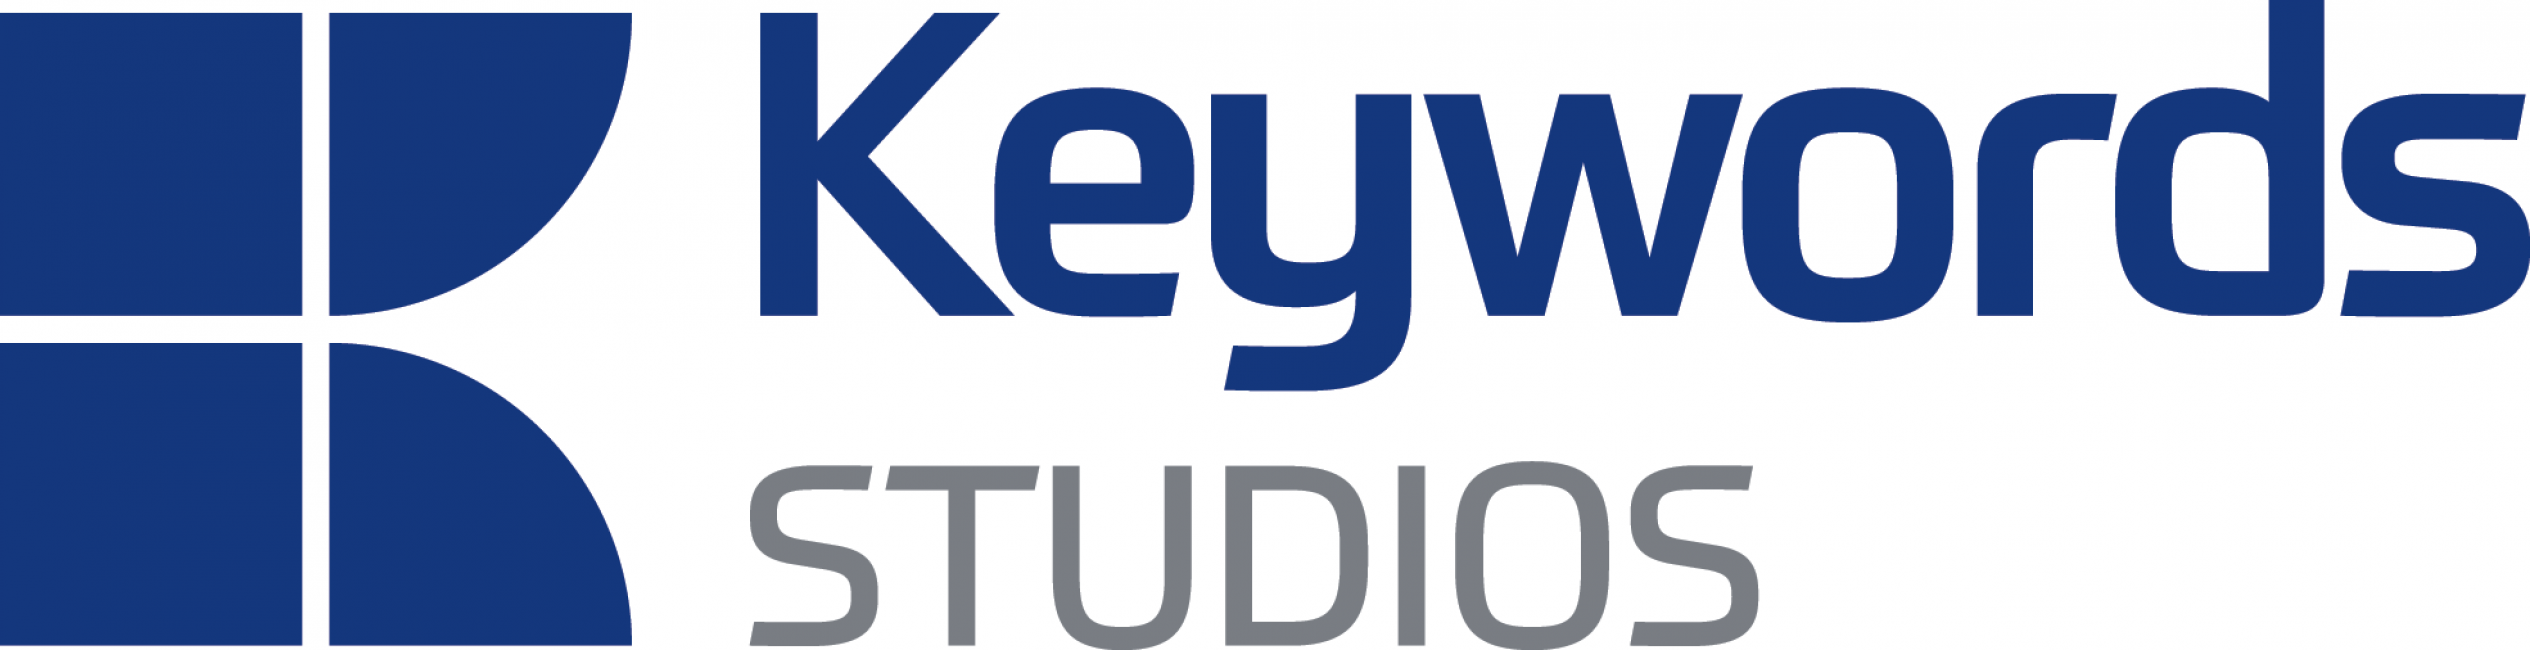 Keywords Studio是Swingvy雲端人資系統的客戶